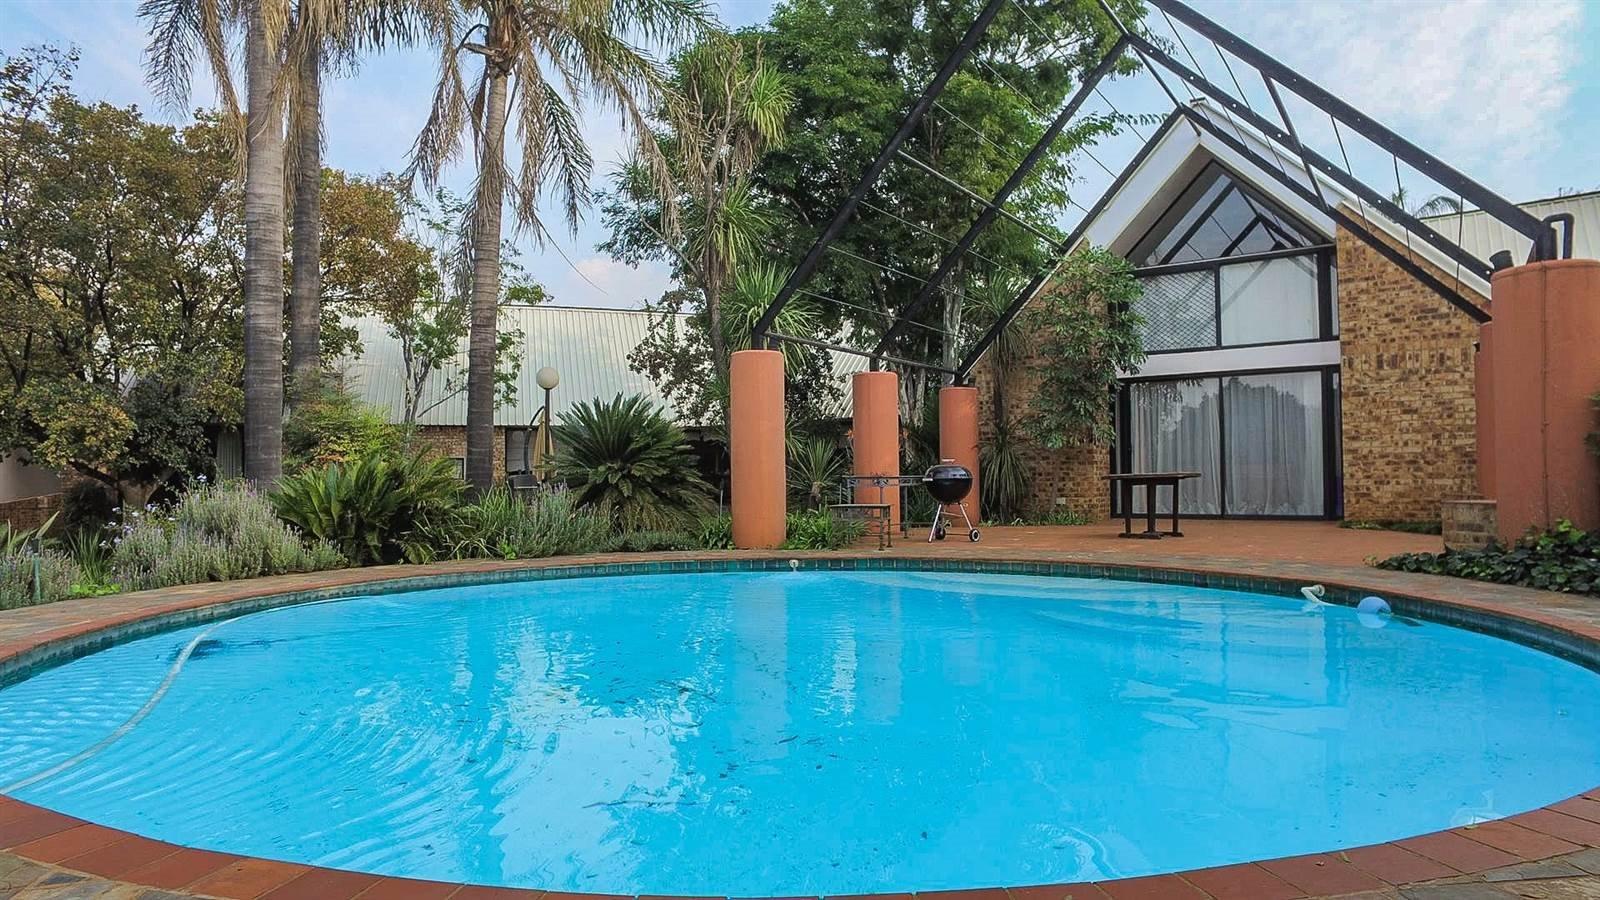 Centurion, Zwartkop Property  | Houses For Sale Zwartkop, Zwartkop, House 5 bedrooms property for sale Price:3,150,000